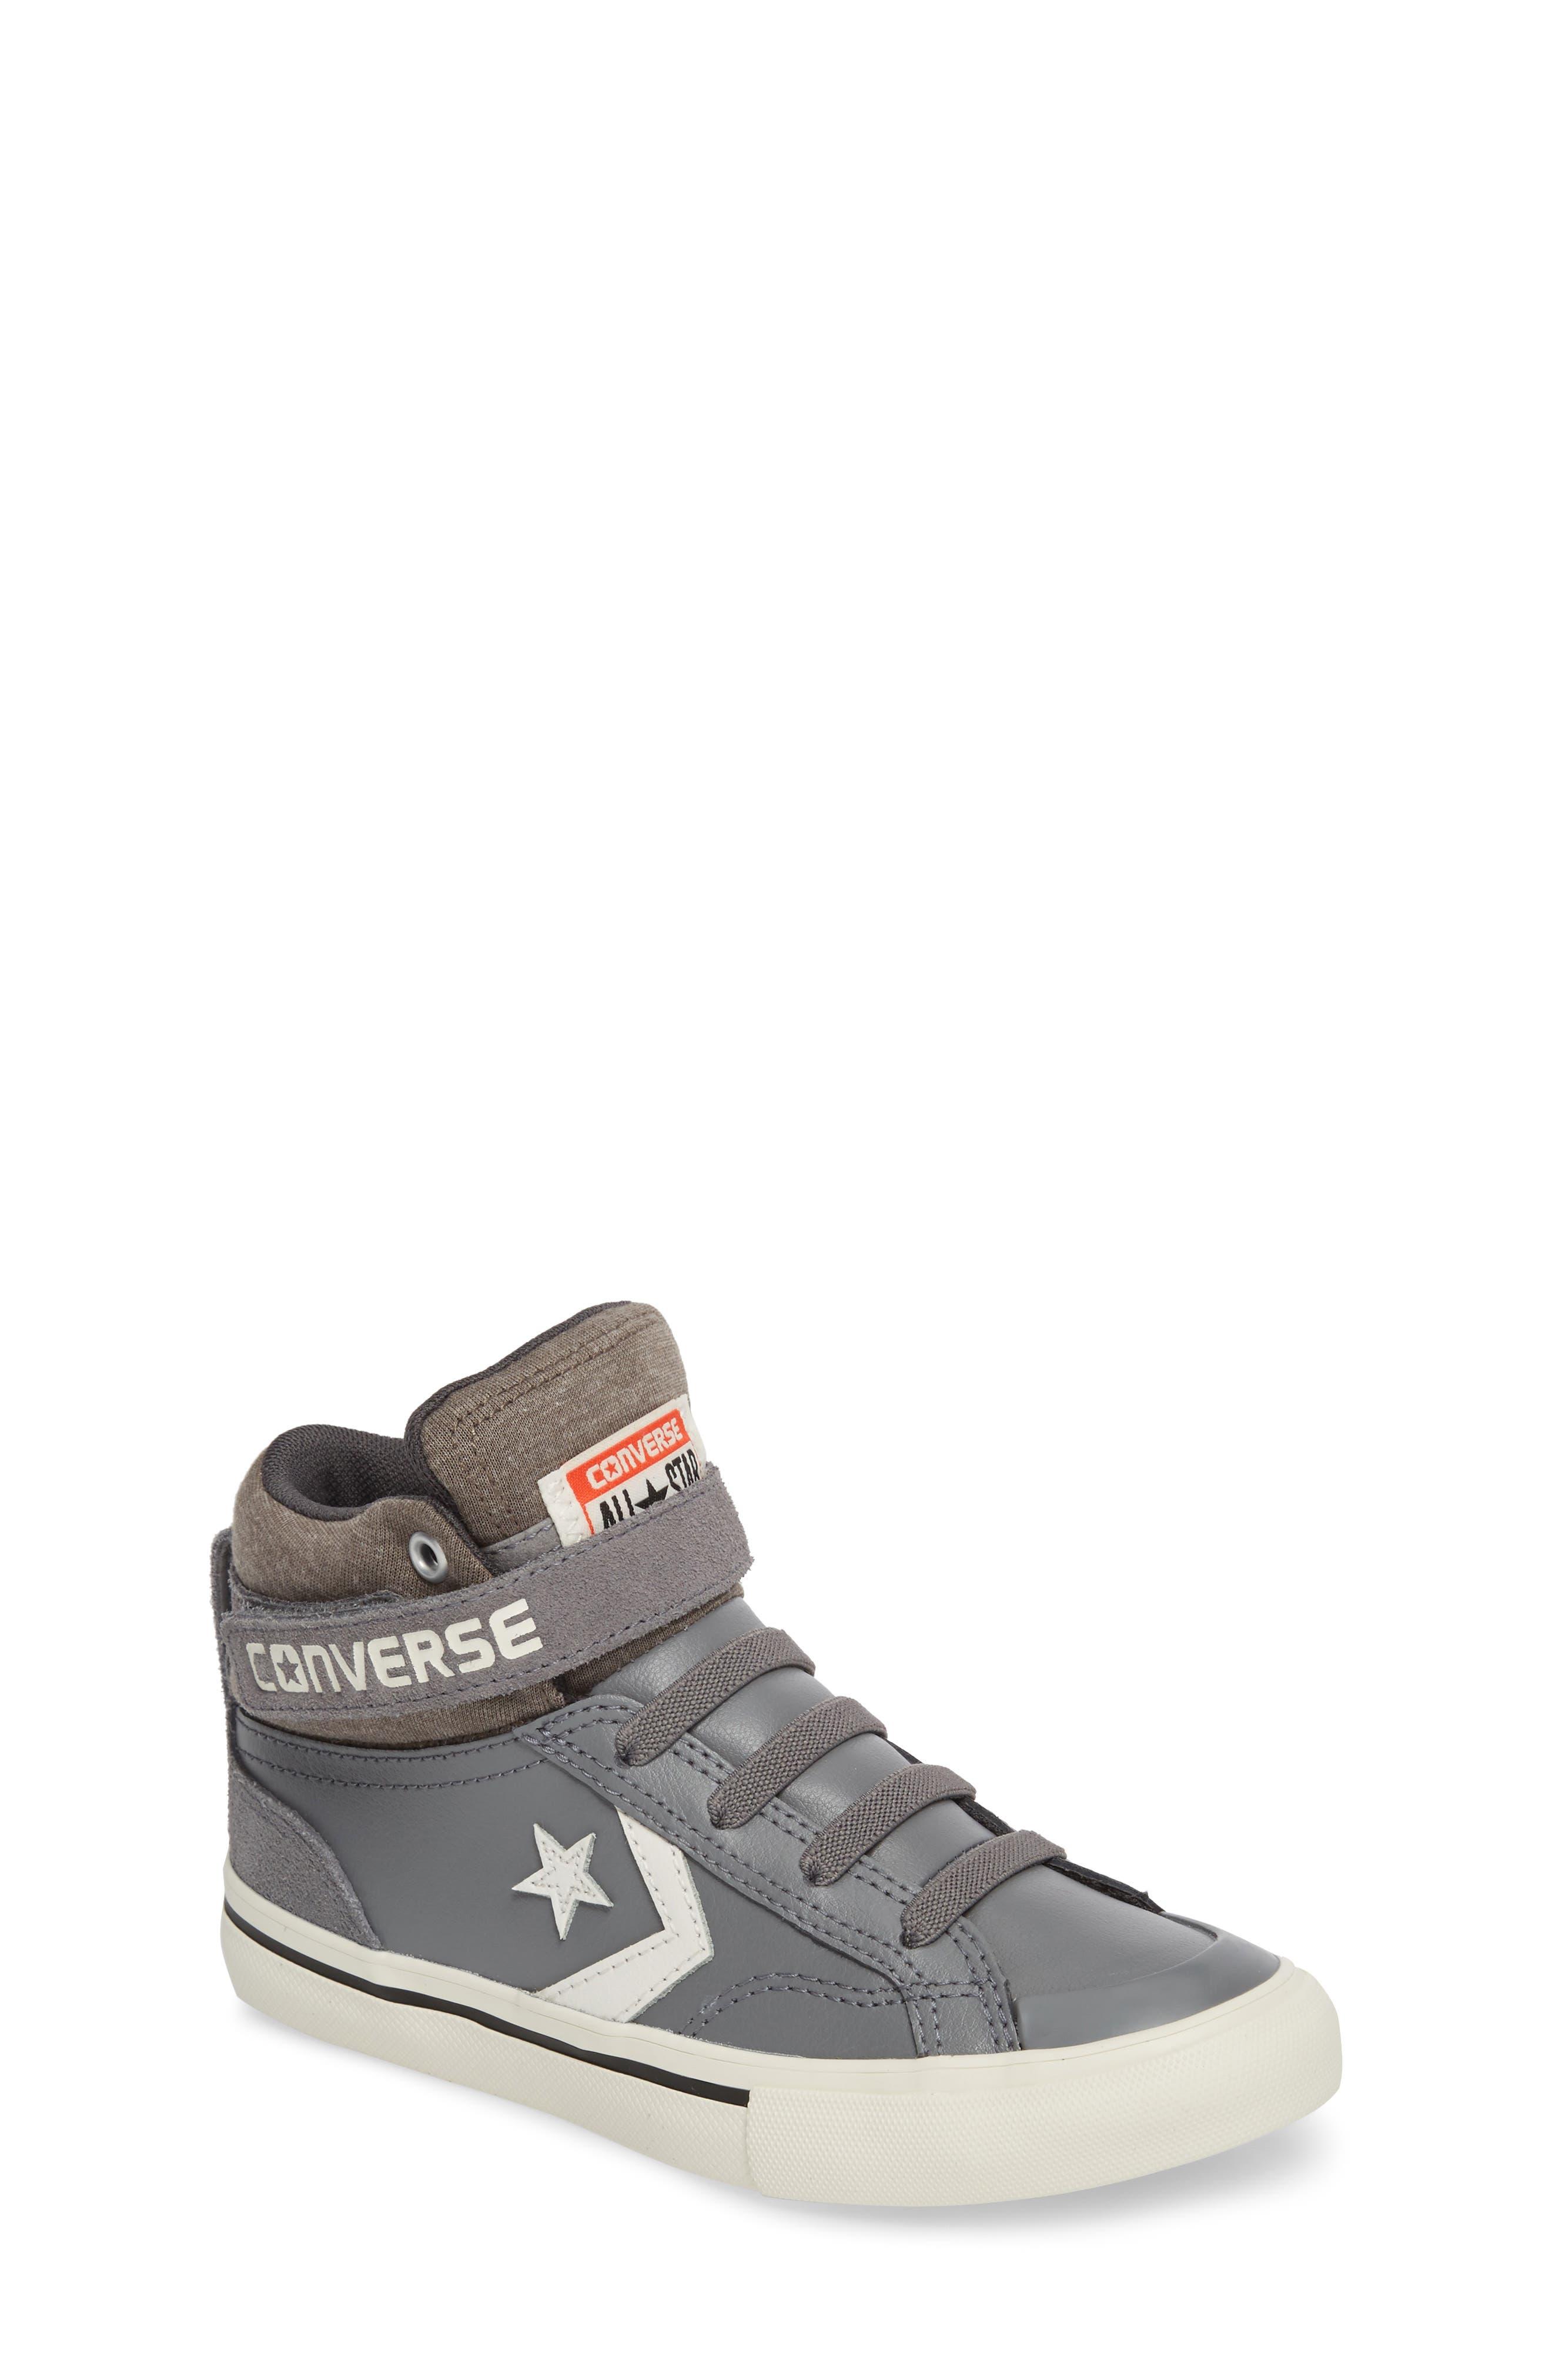 Pro Blaze High Top Sneaker,                         Main,                         color, Mason Leather